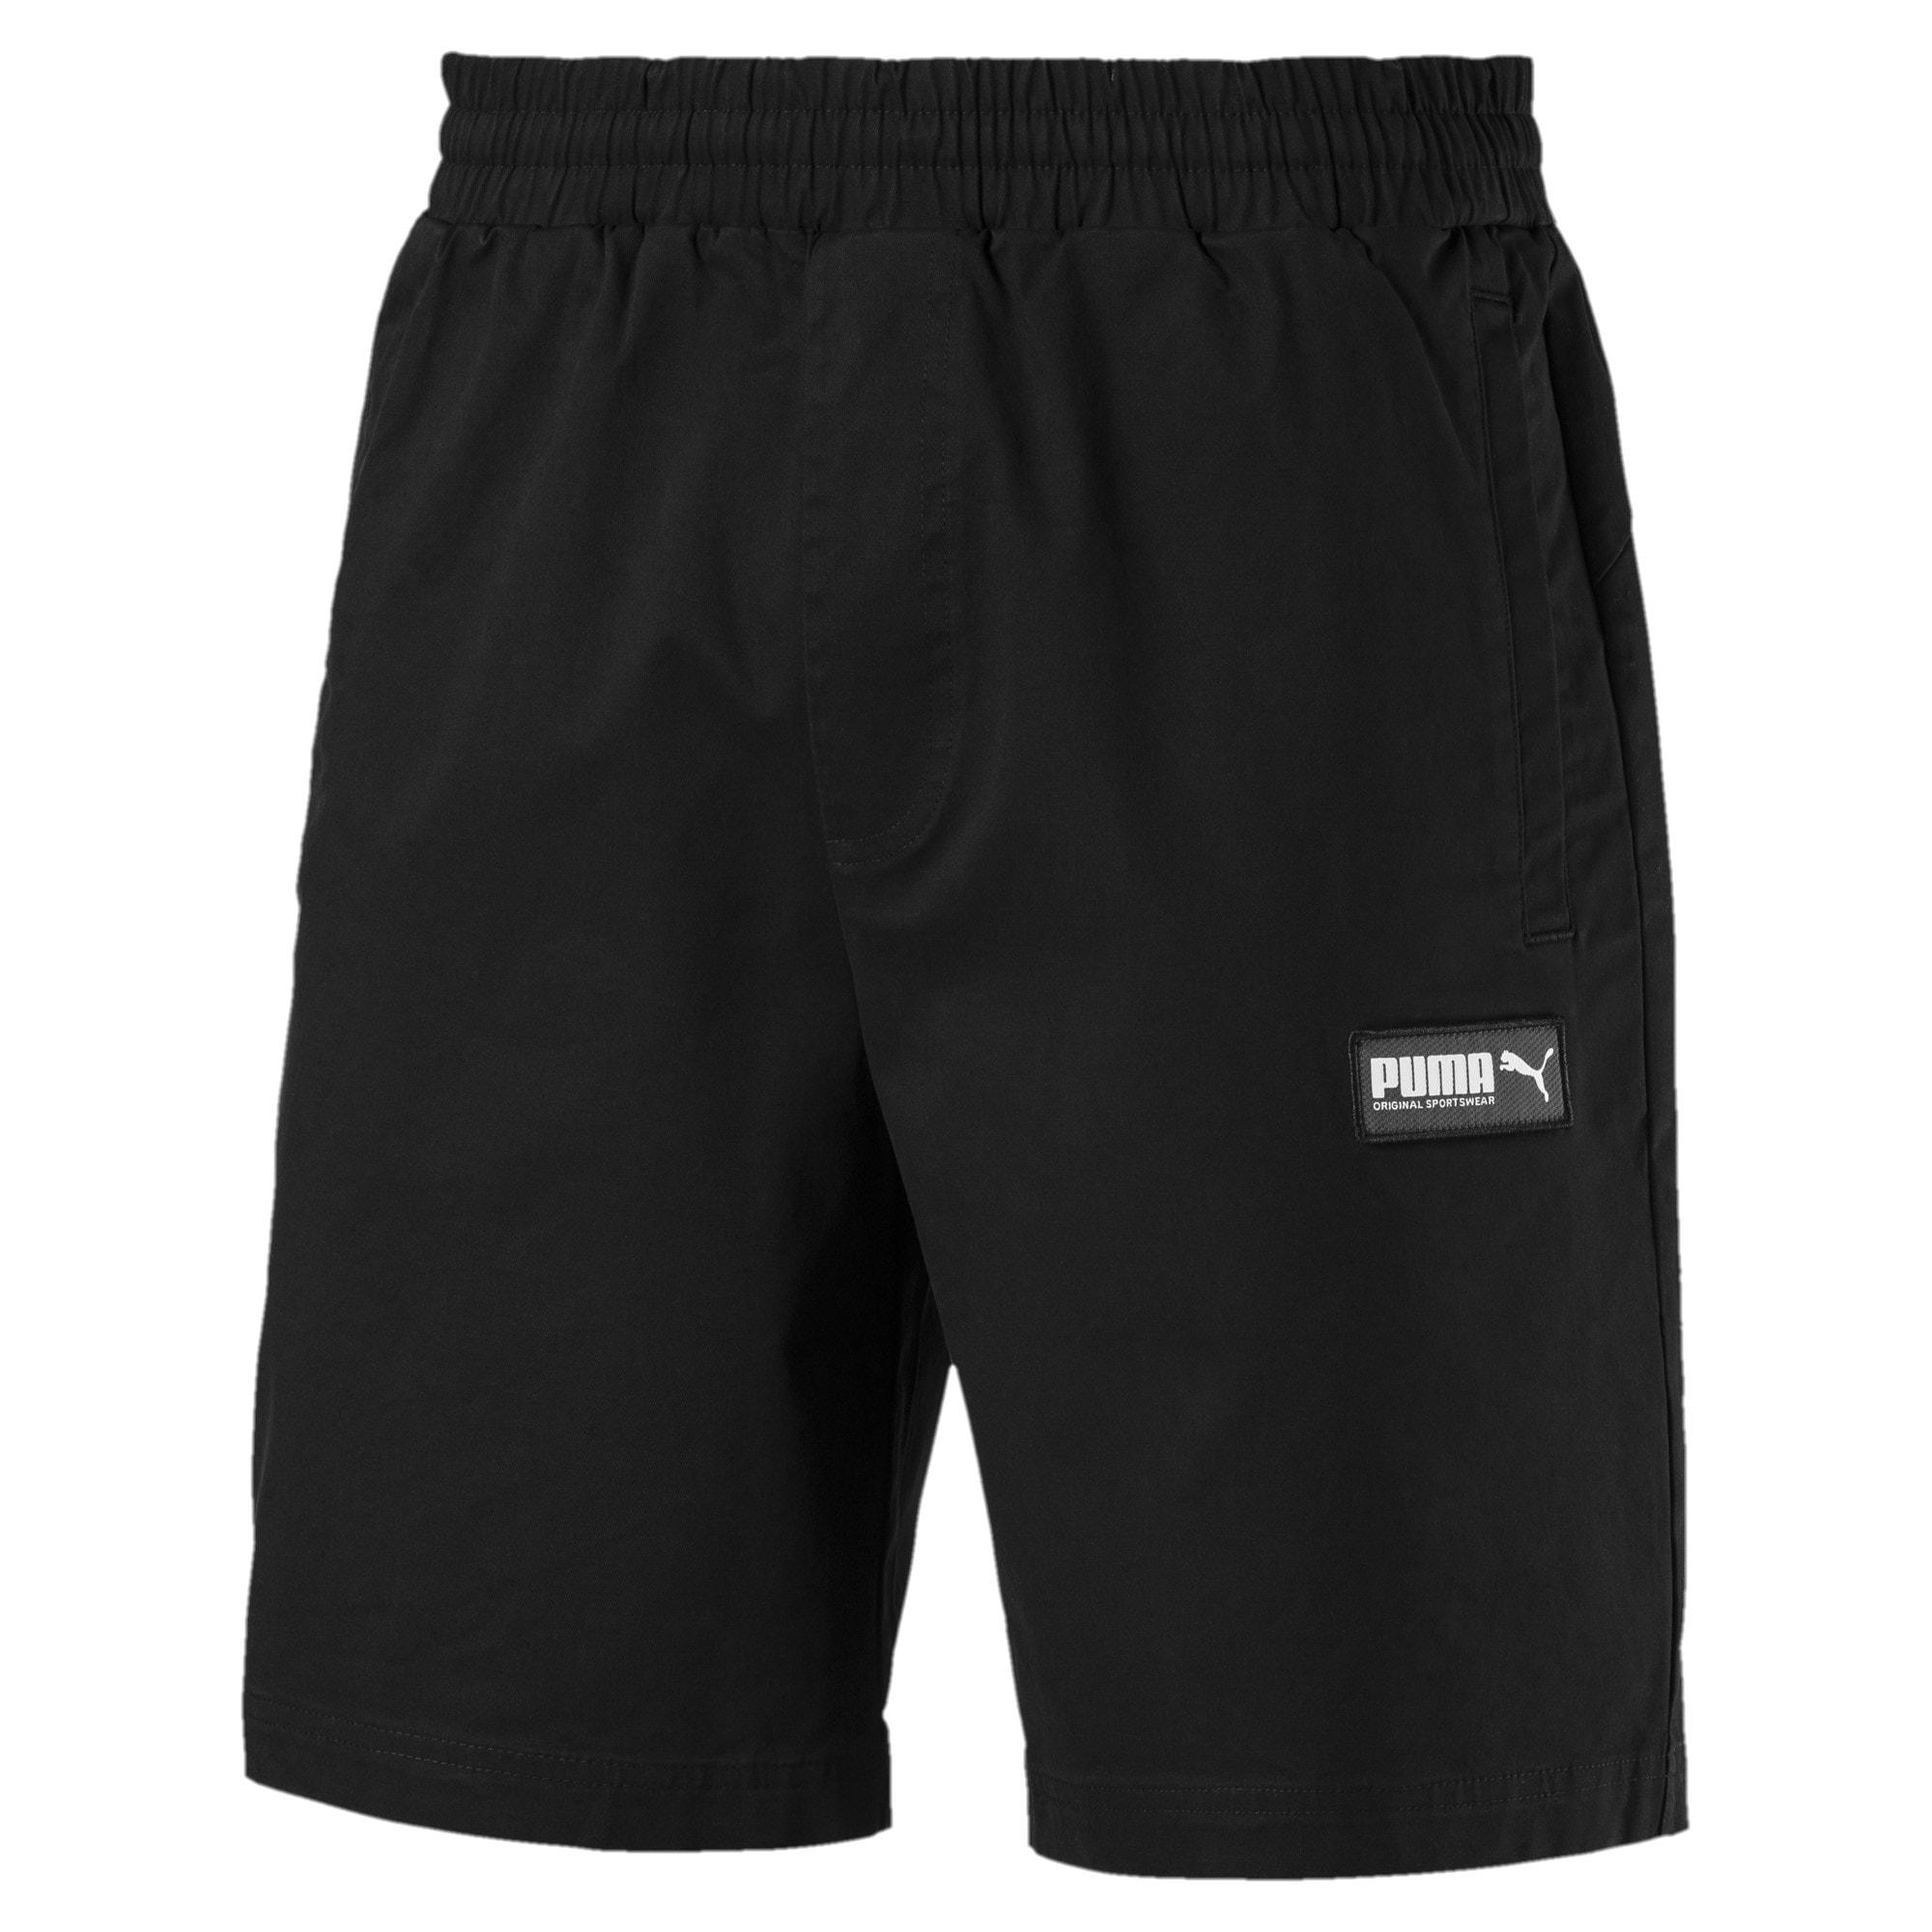 Thumbnail 4 of Fusion Men's Shorts, Puma Black, medium